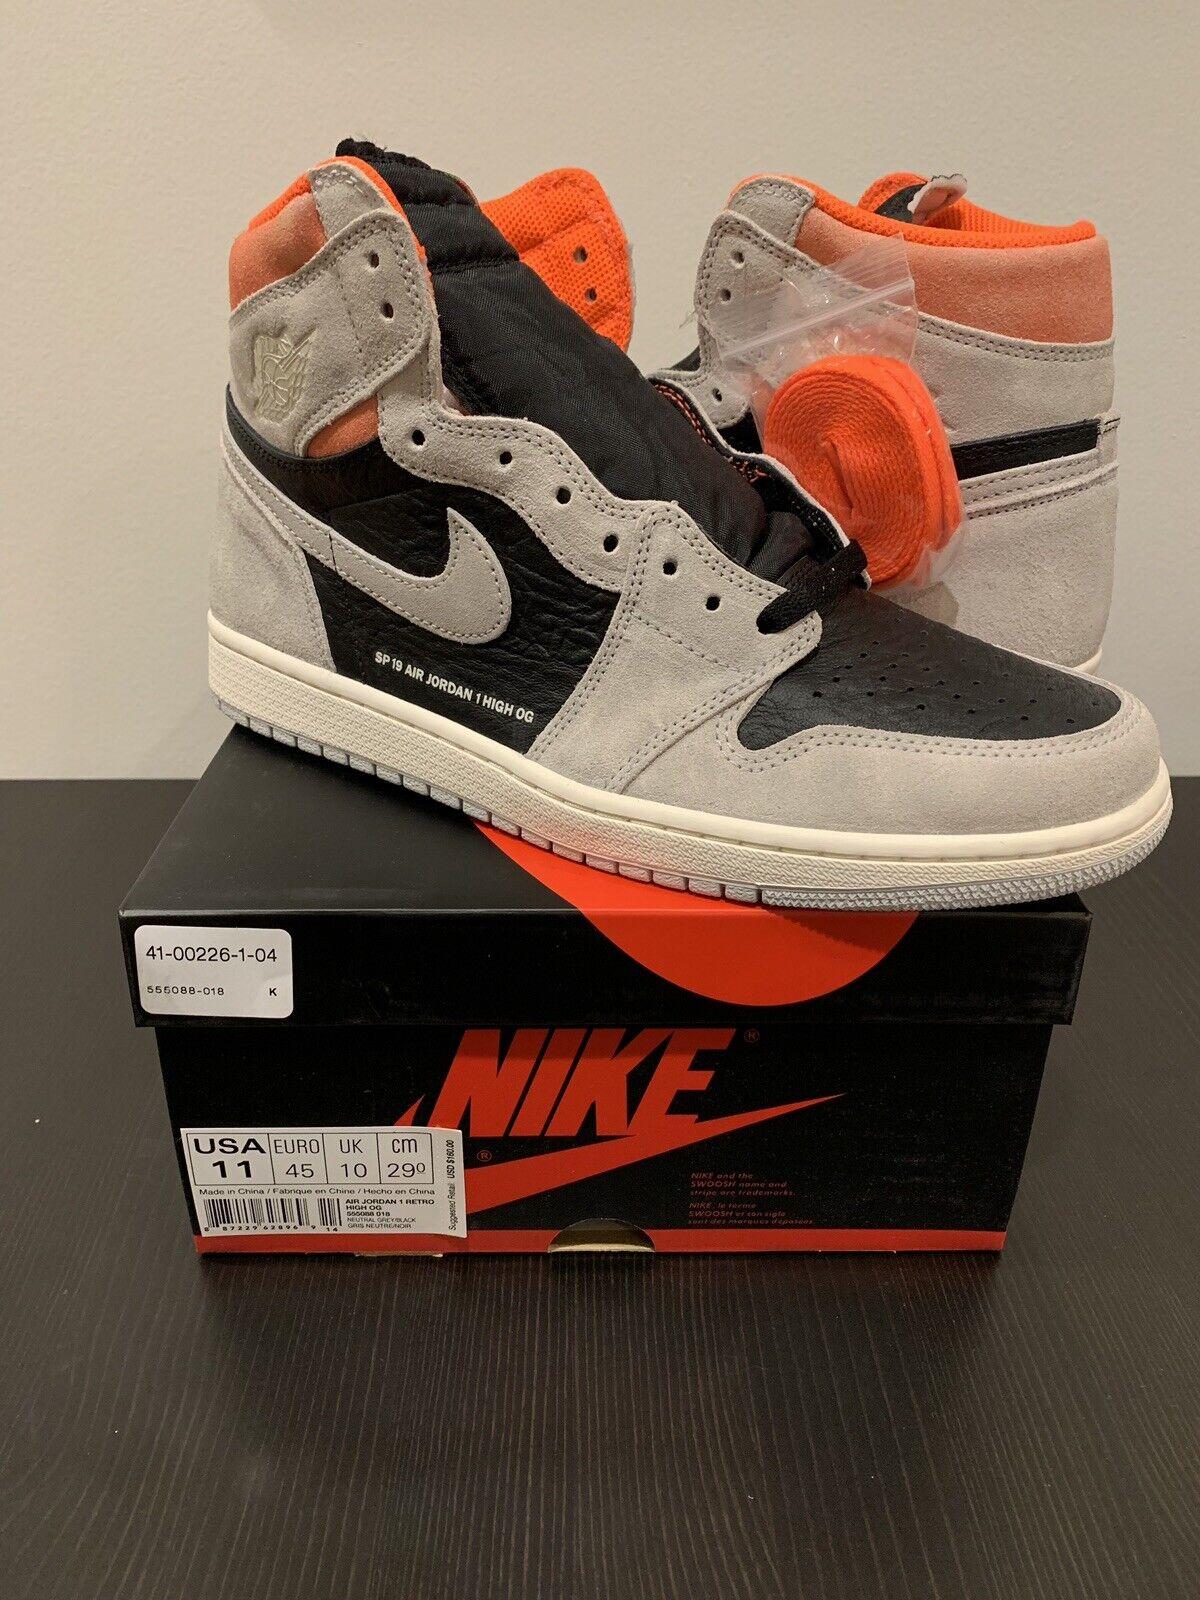 Nike Air Jordan 1 Retro High OG Grey Hyper Crimson Size 11 W Receipt 555088-018